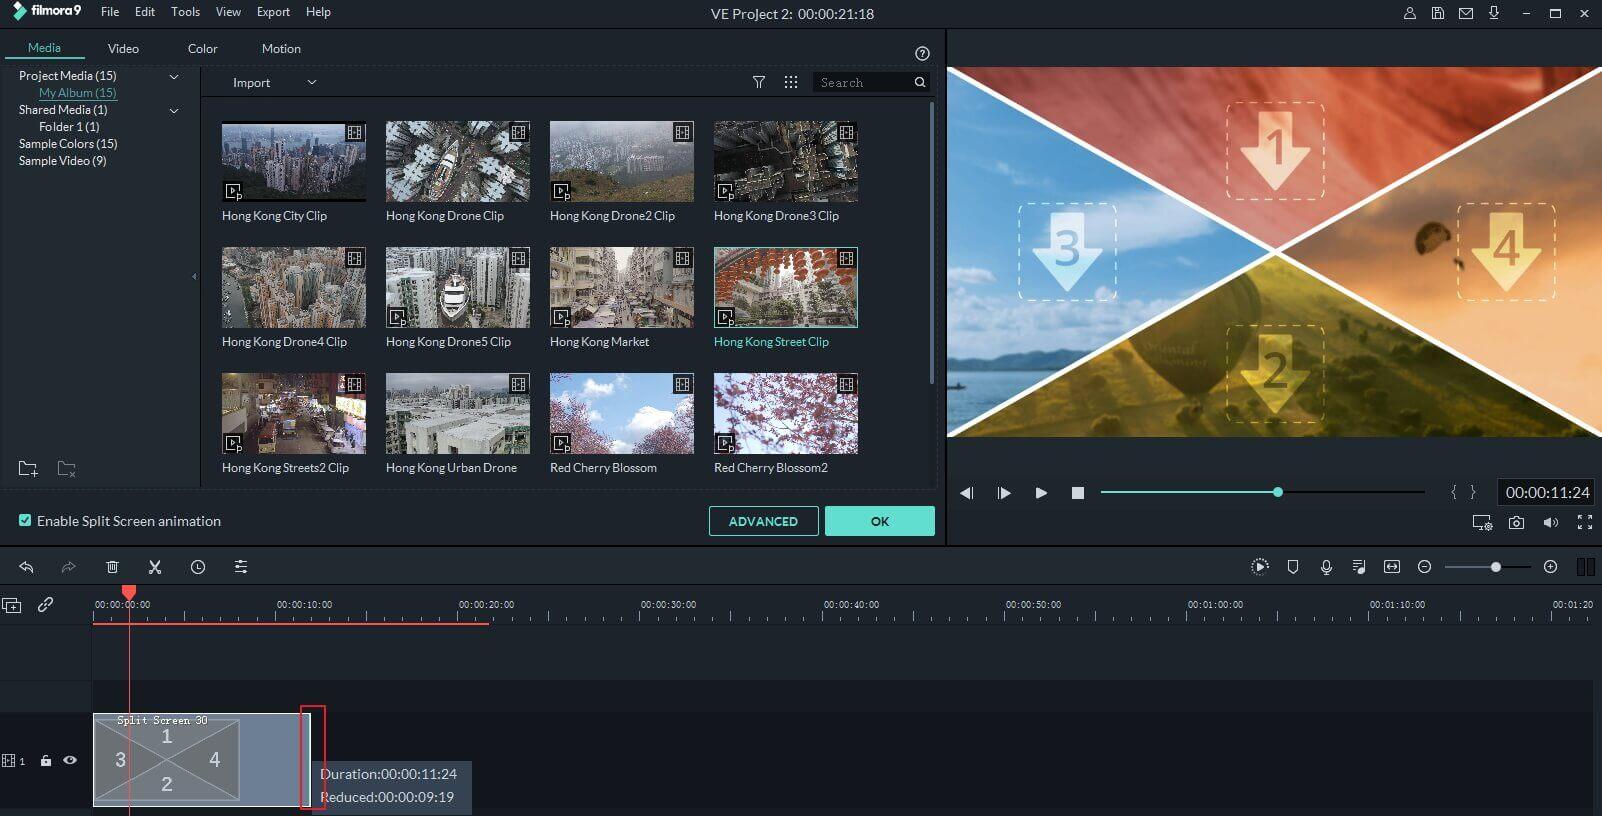 ferramentas de marketing: Filmora dashboard